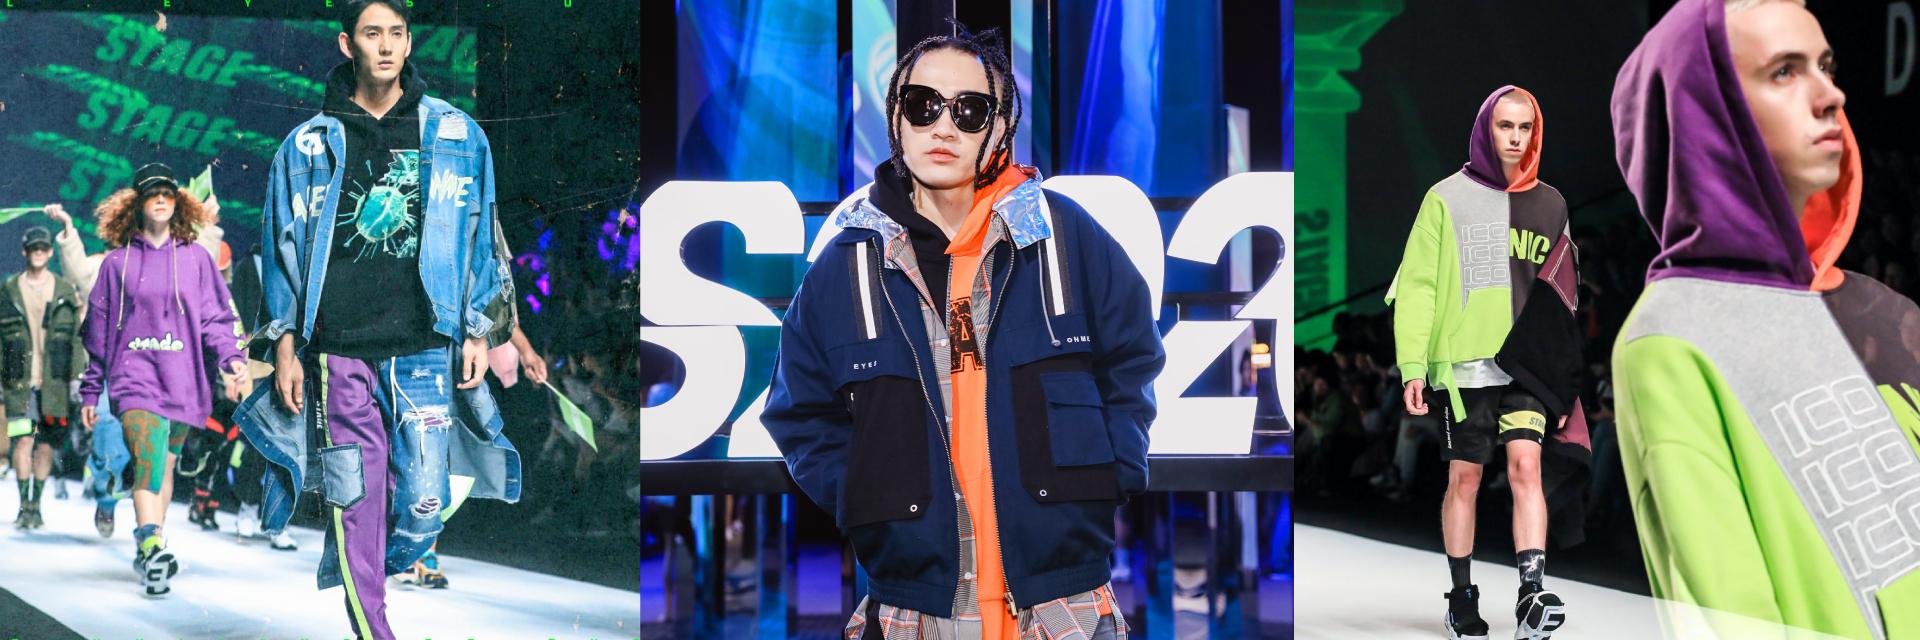 STAGE 完全進化!「透明舞台」搶灘上海時裝週,技壓全場秒殺上百品牌!